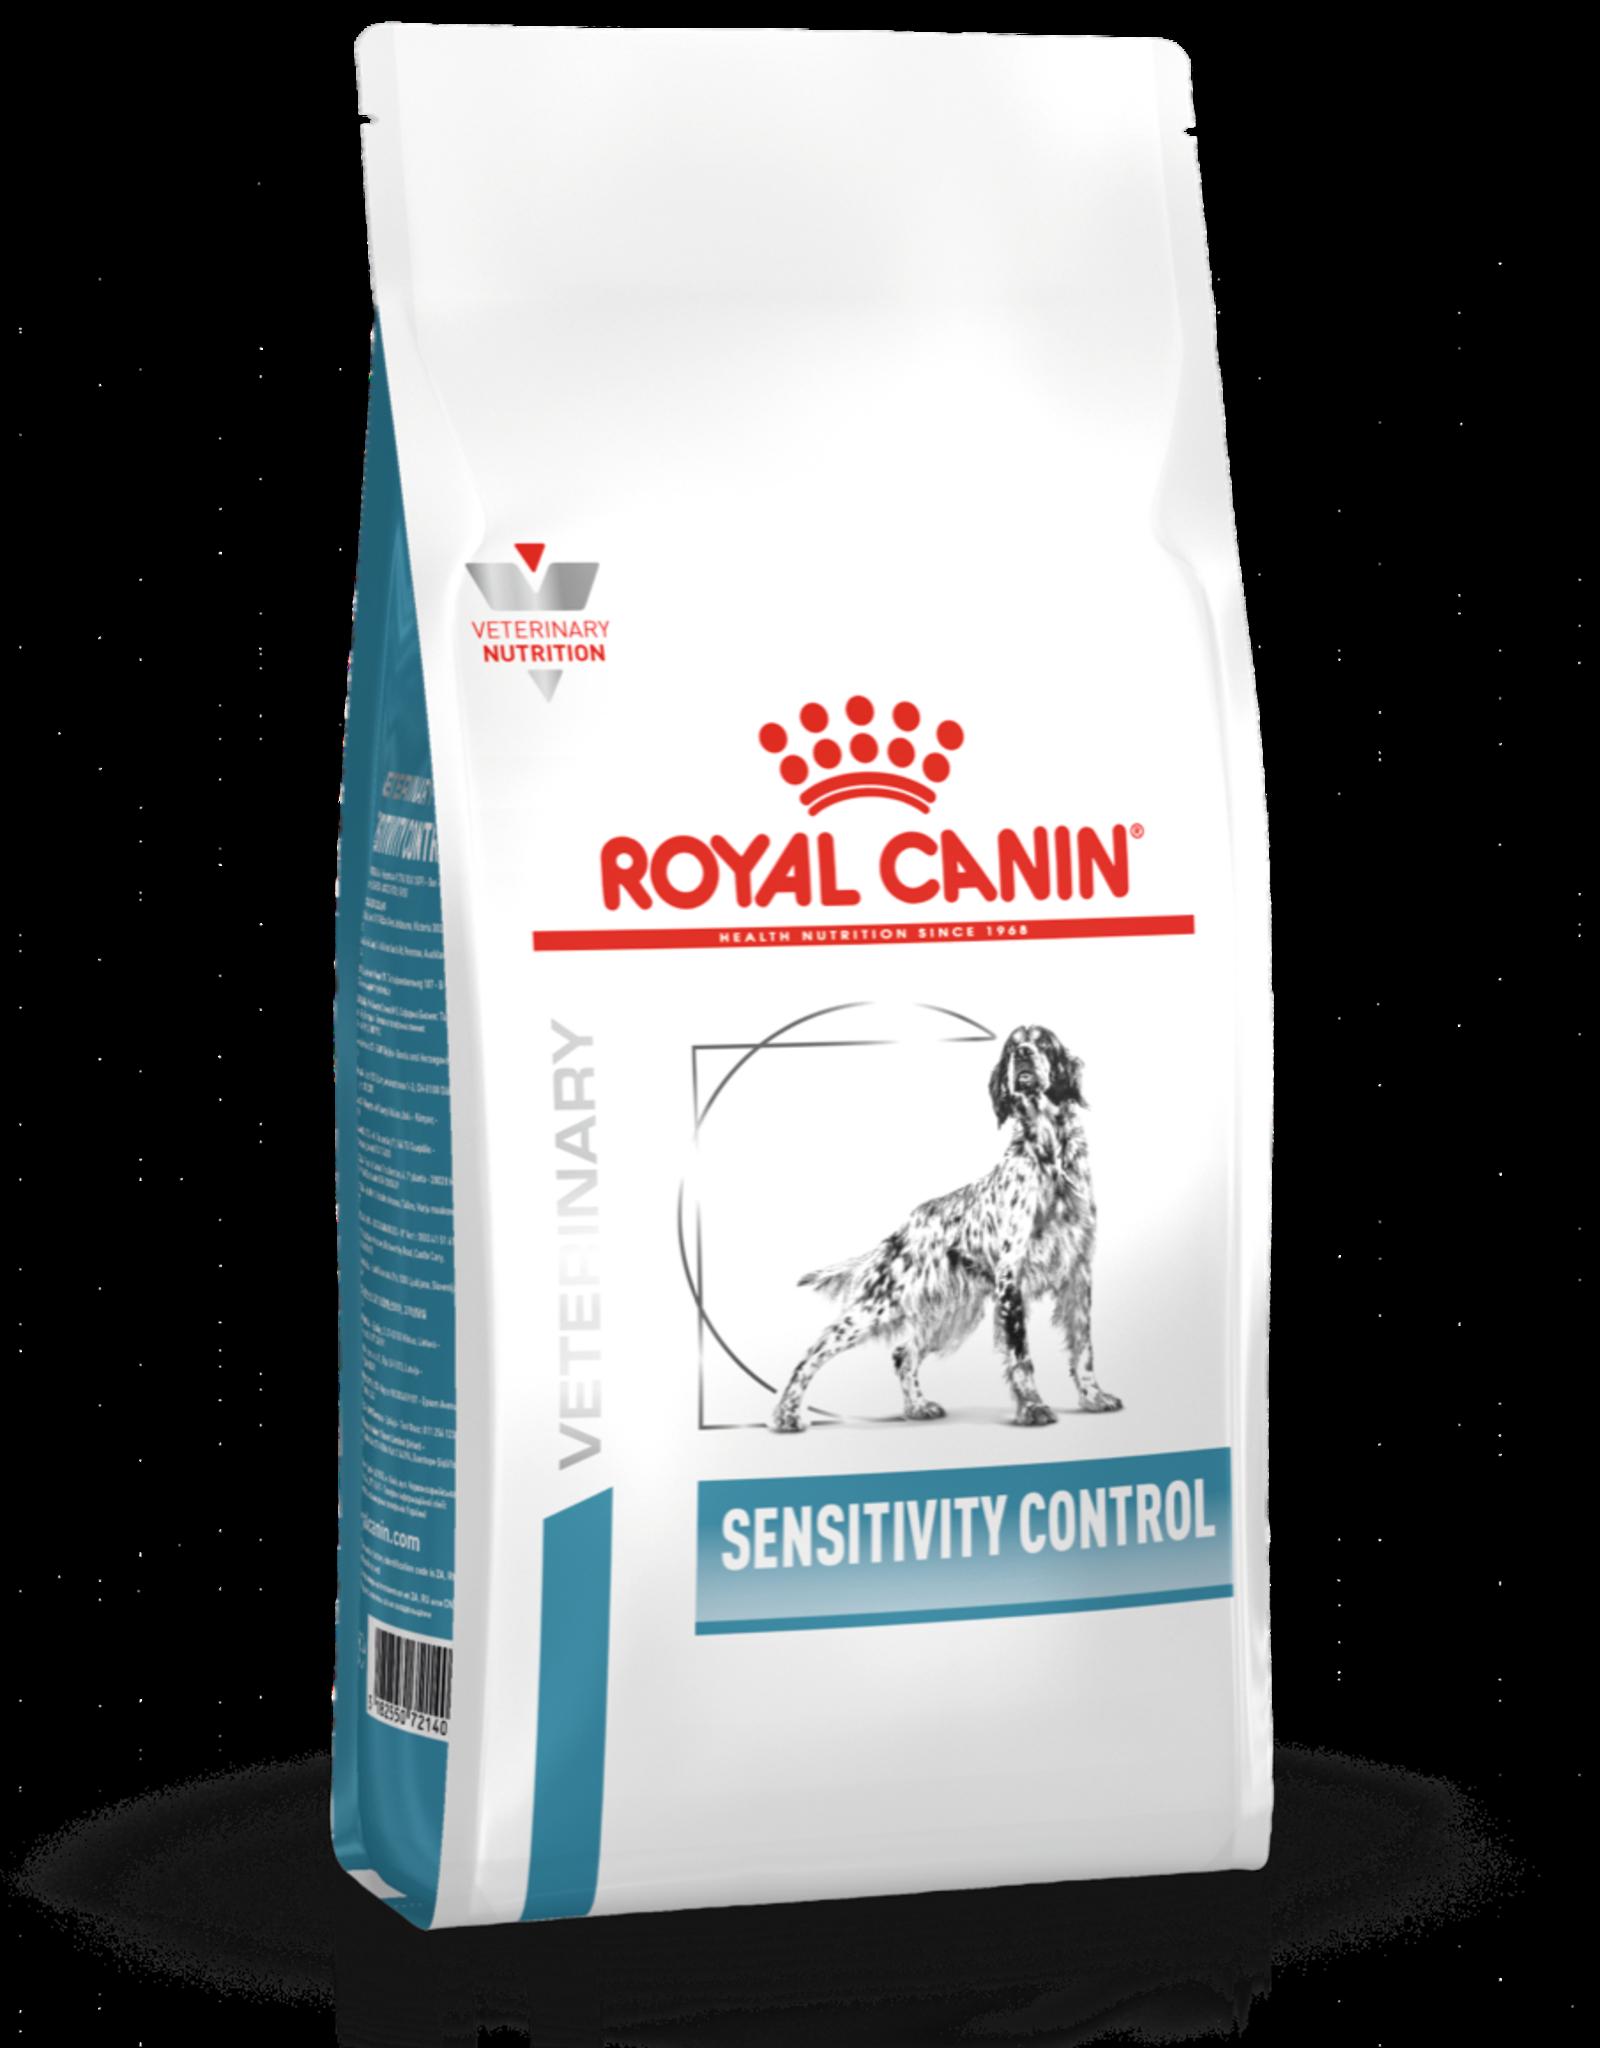 Royal Canin Royal Canin Sensitivity Control Chien Canard 1,5kg